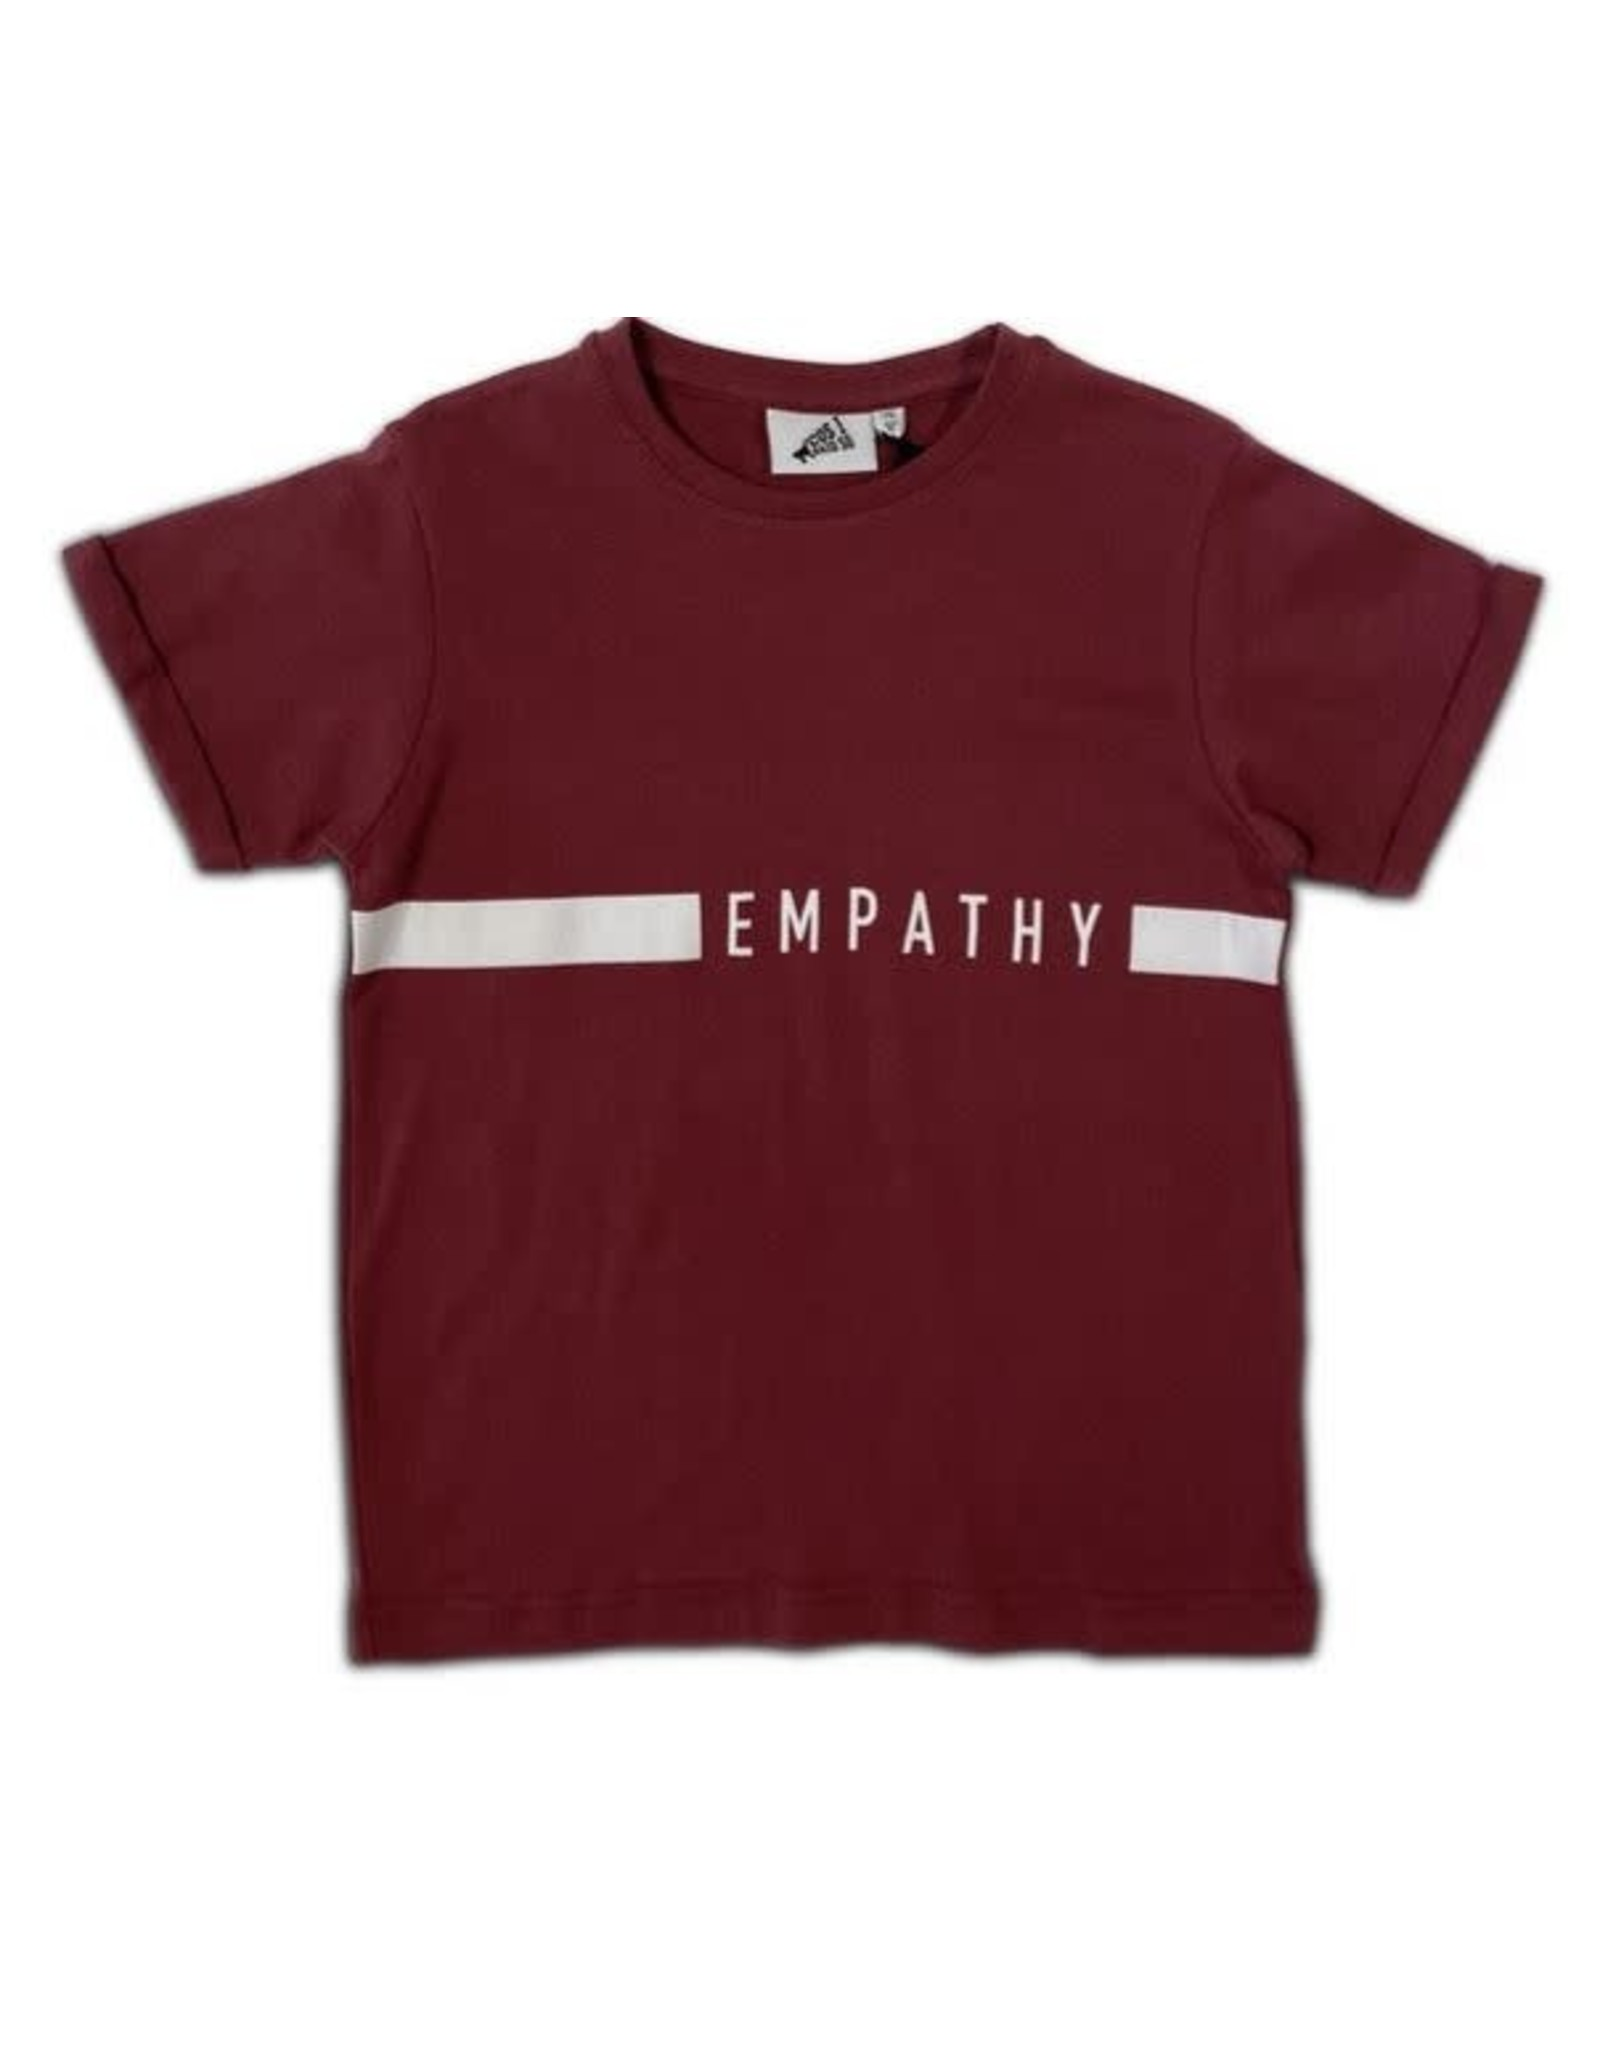 Cos I Said So t-shirt emphaty